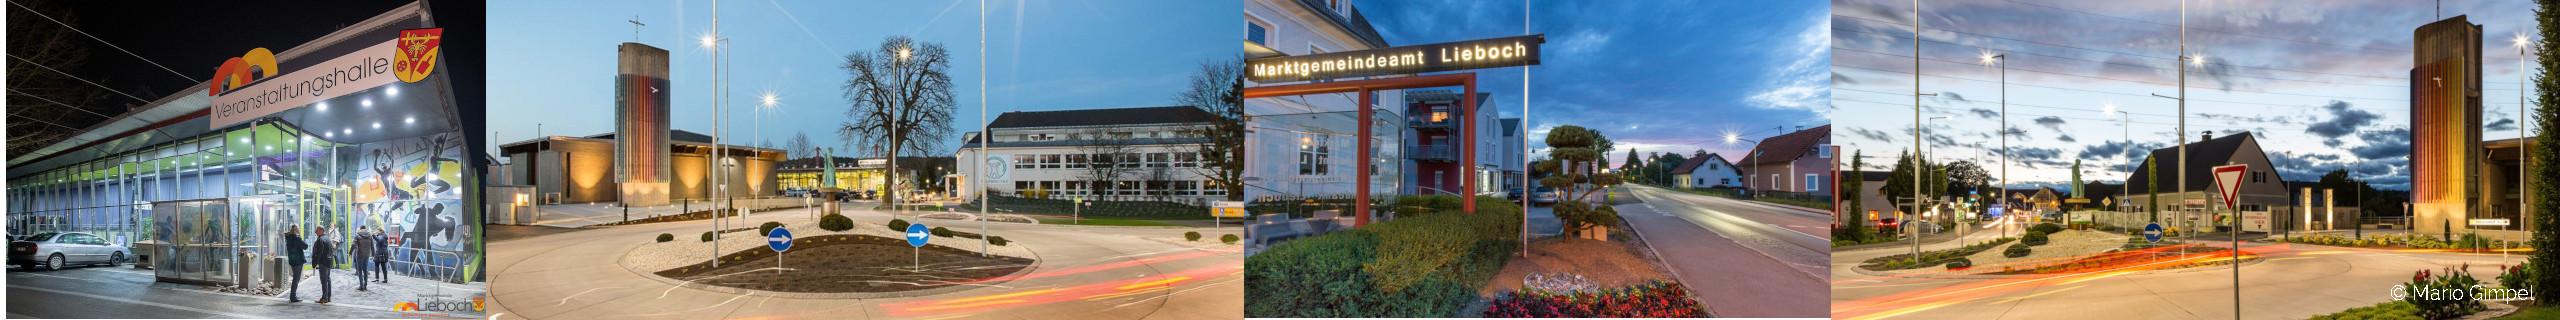 Singlebrse in Lieboch bei Graz-Umgebung und Singletreff